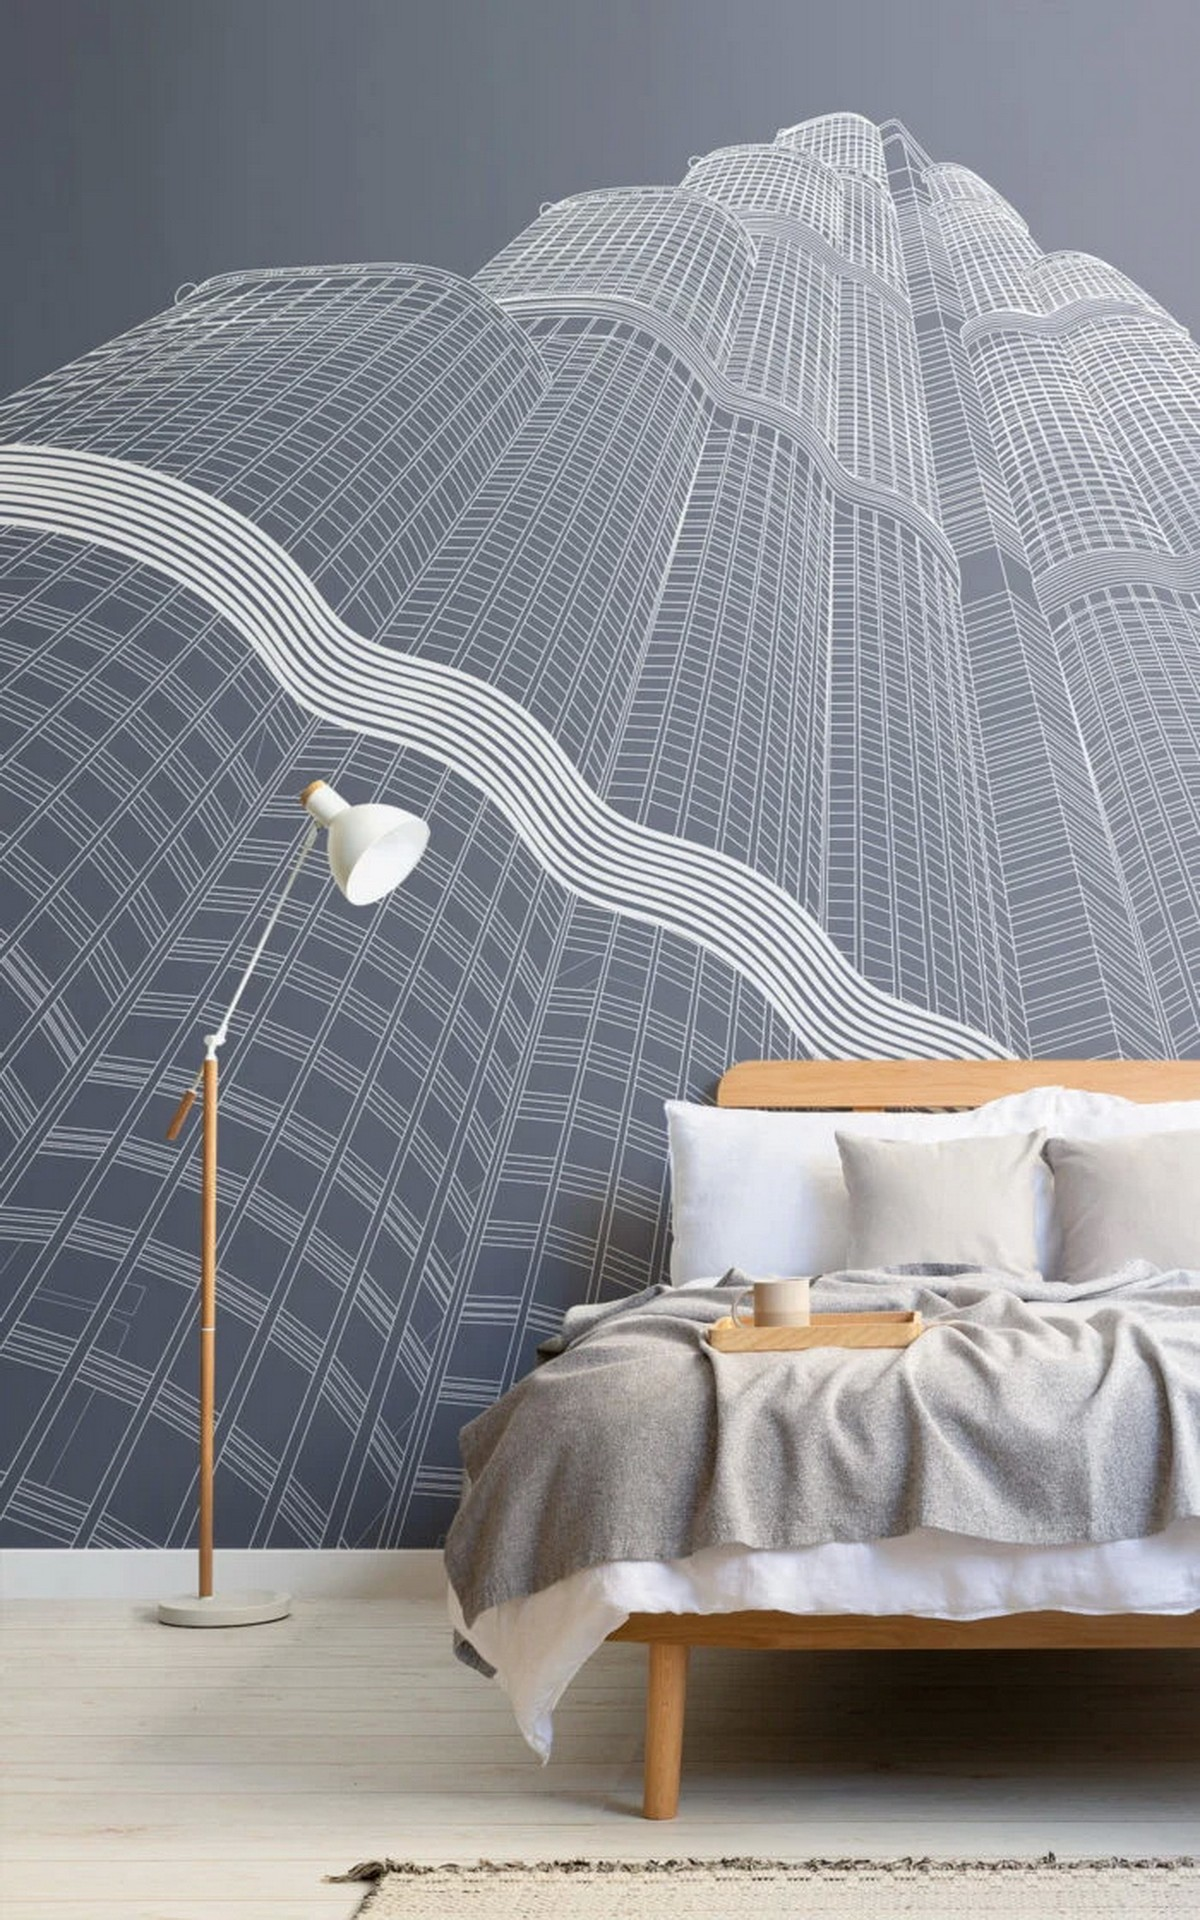 walldeko-Διακοσμητική τοιχογραφία στο εσωτερικό 03